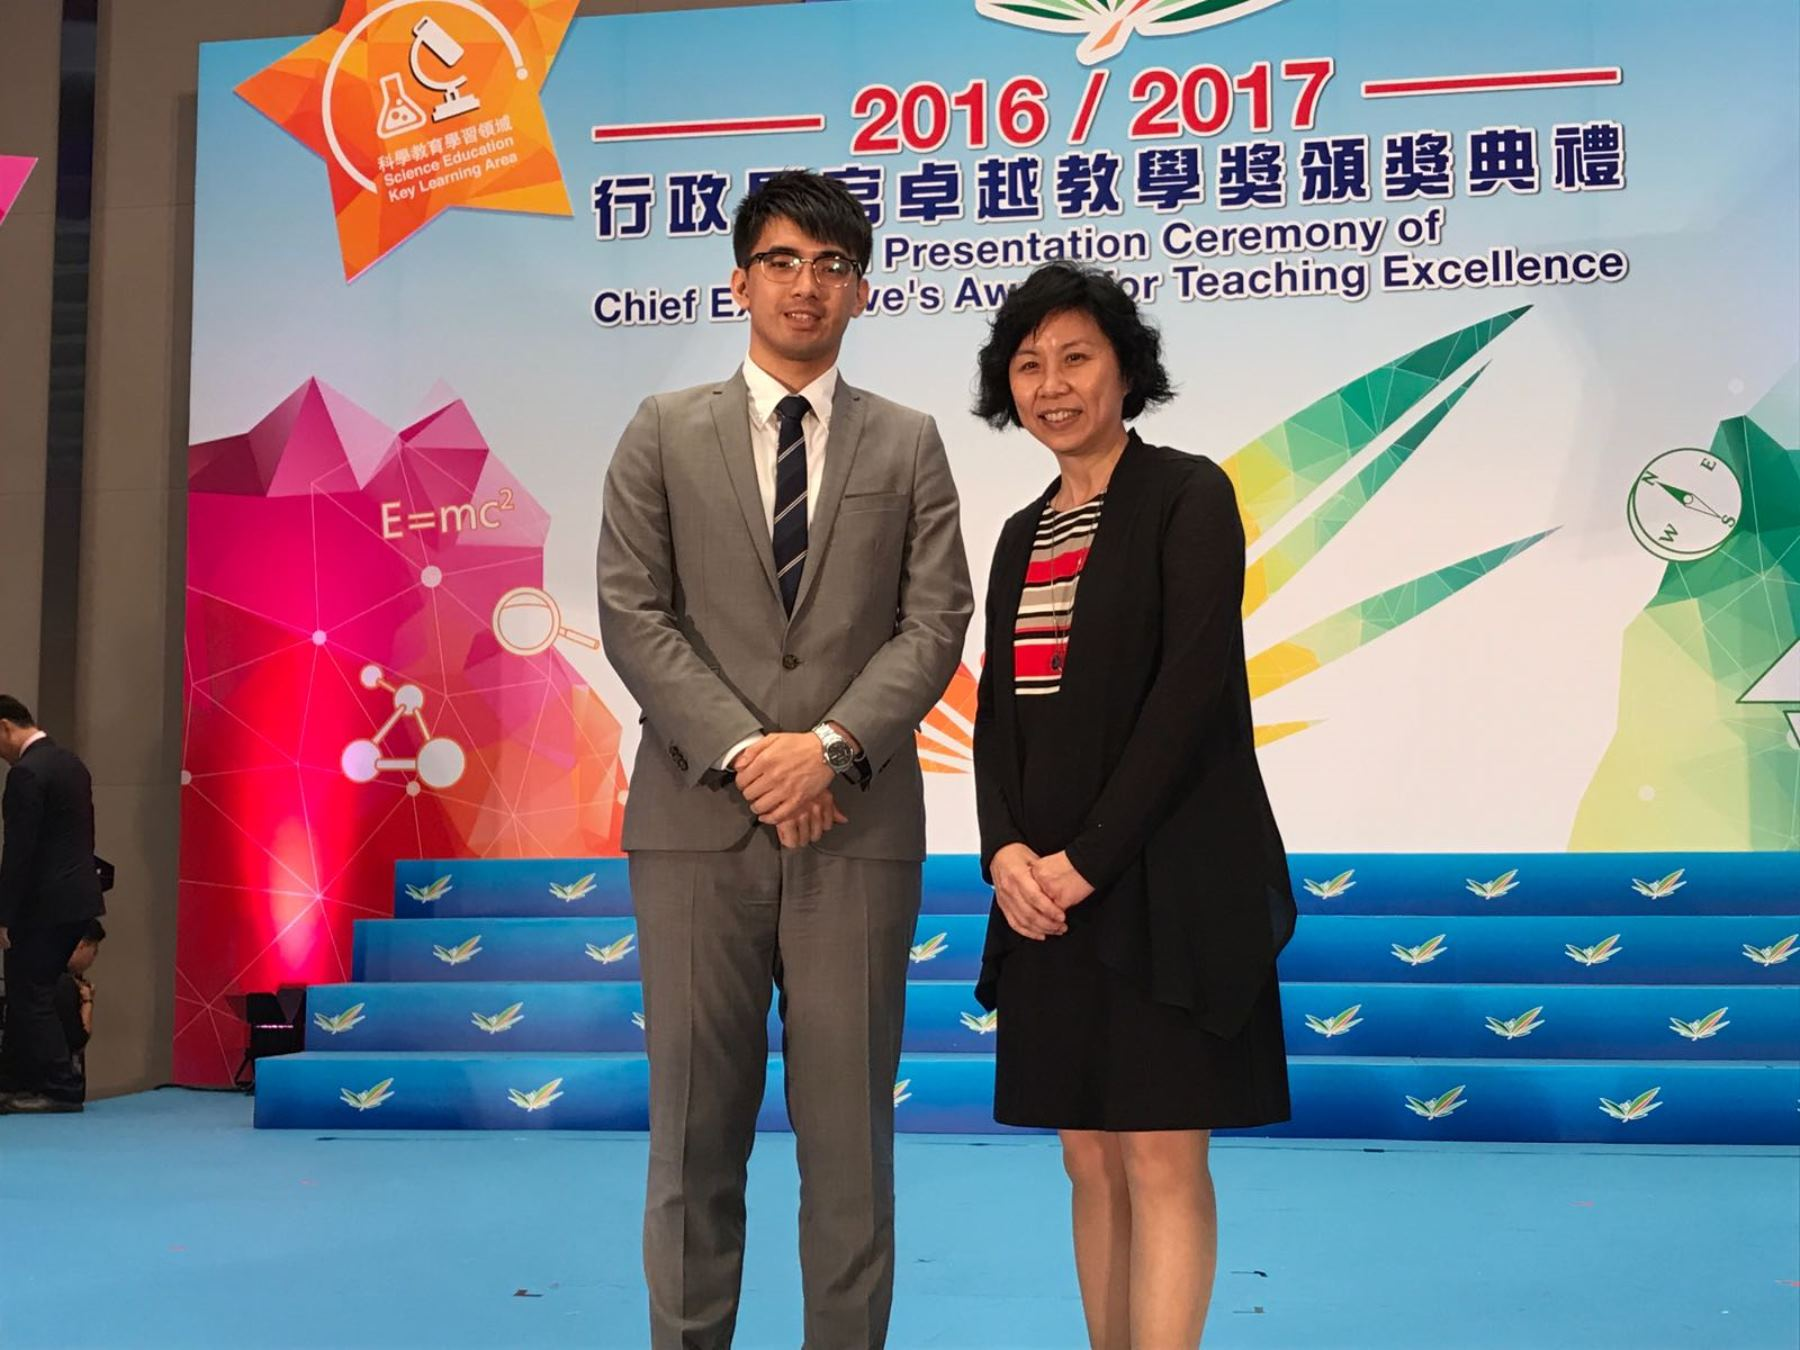 http://www.npc.edu.hk/sites/default/files/img-20170623-wa0023.jpg